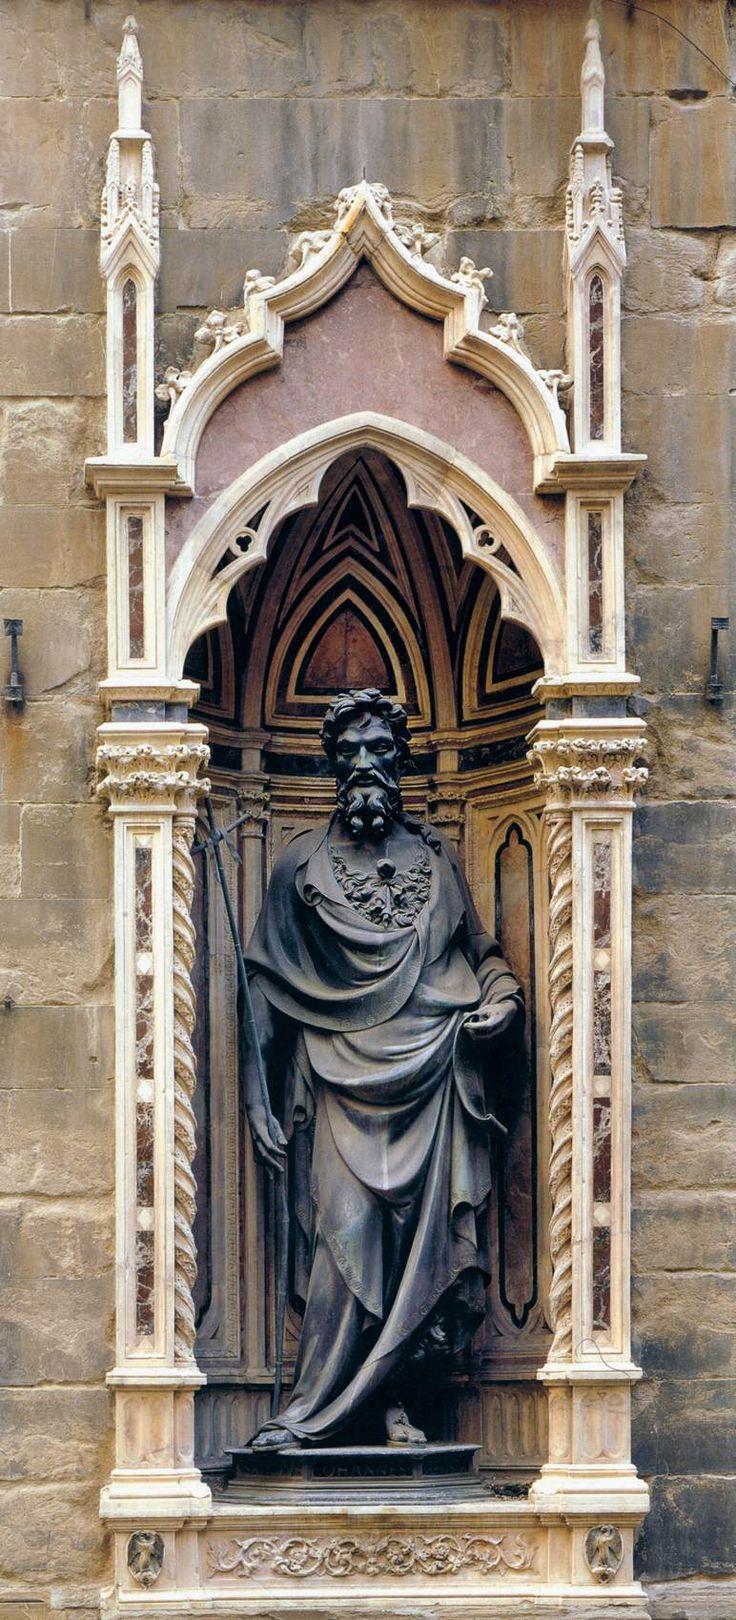 St. John the Baptist 1412-16 | Bronze, height 254 cm | Orsanmichele, Florence | Lorenzo Ghiberti